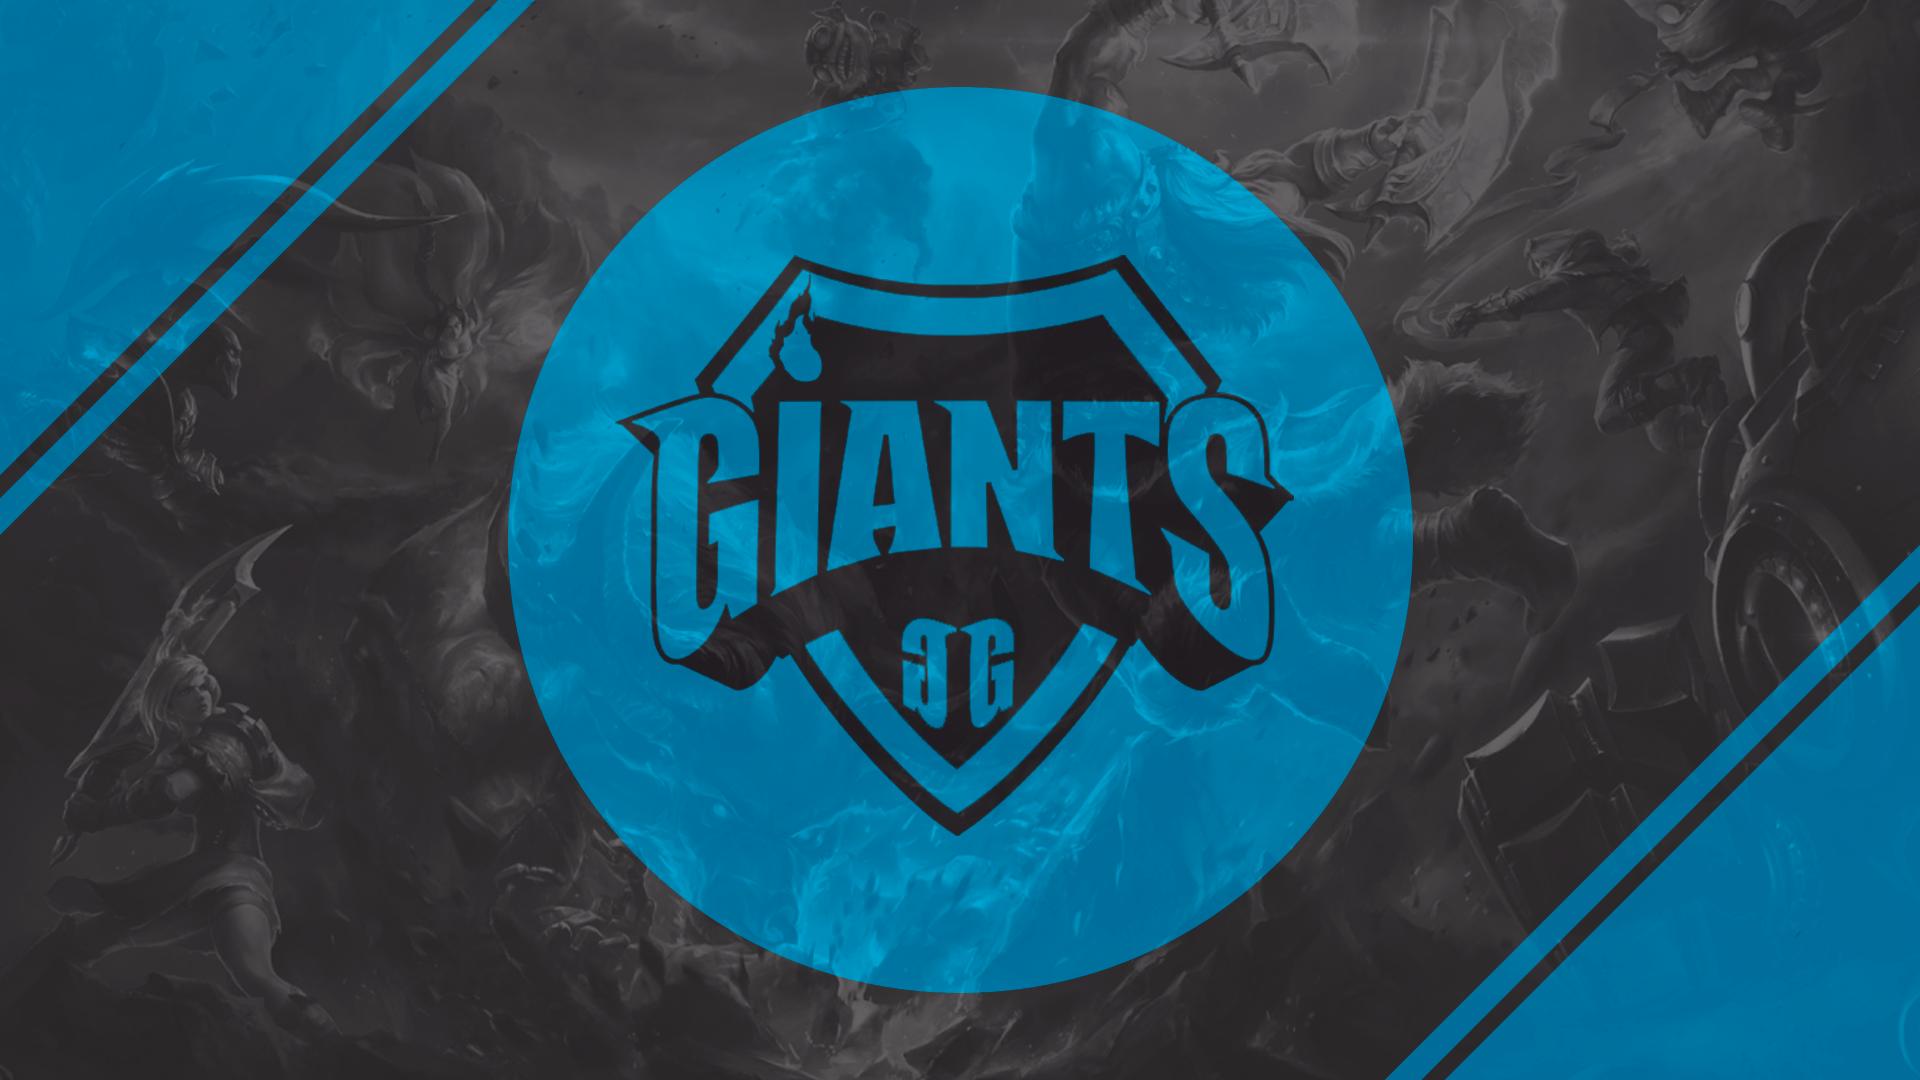 Giants wallpaper